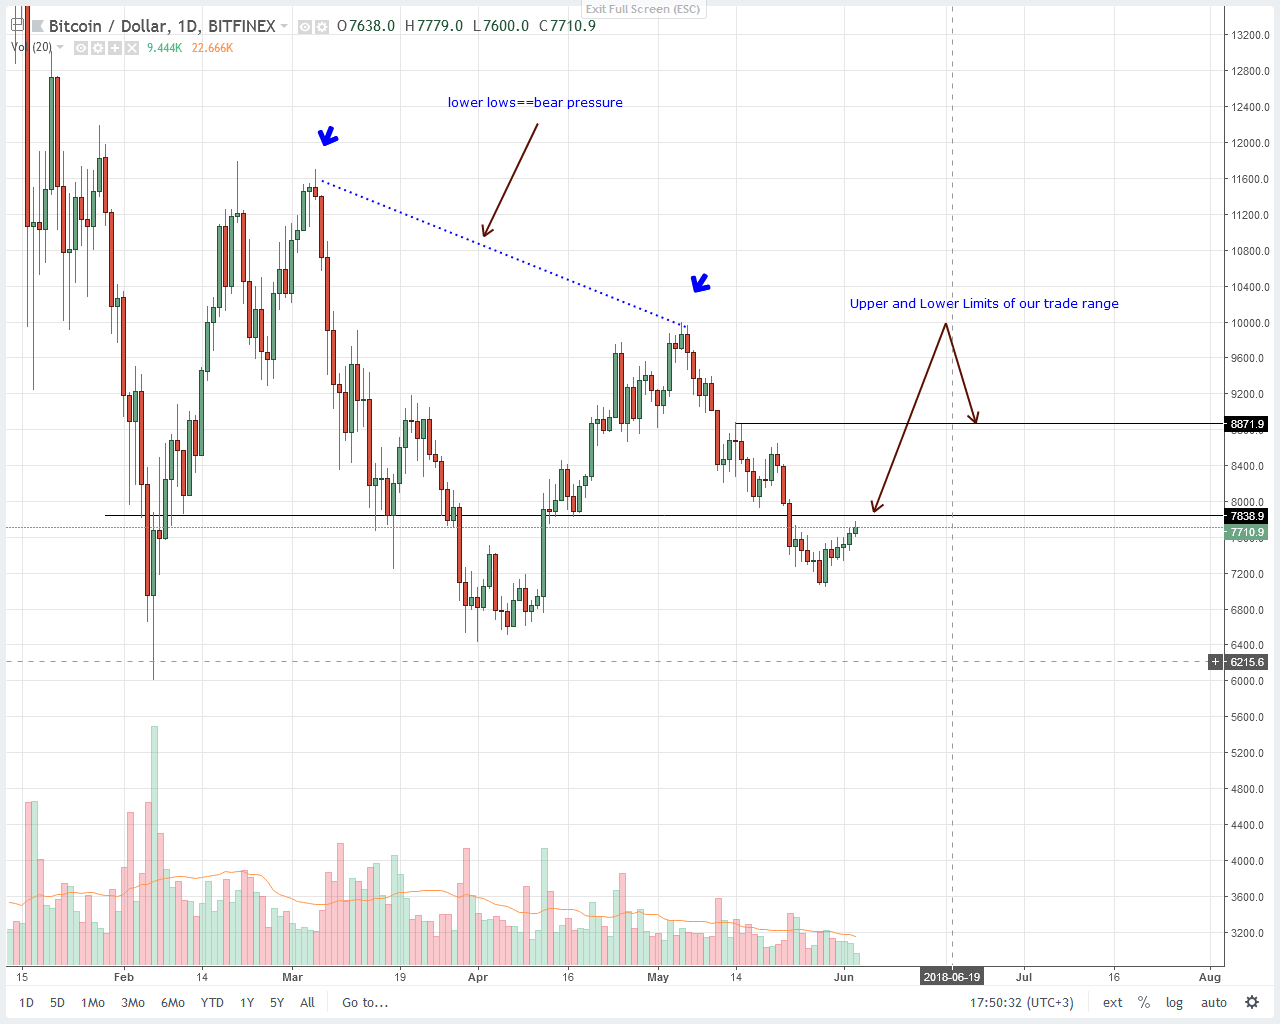 Bitcoin (BTC) Price Technical Analysis